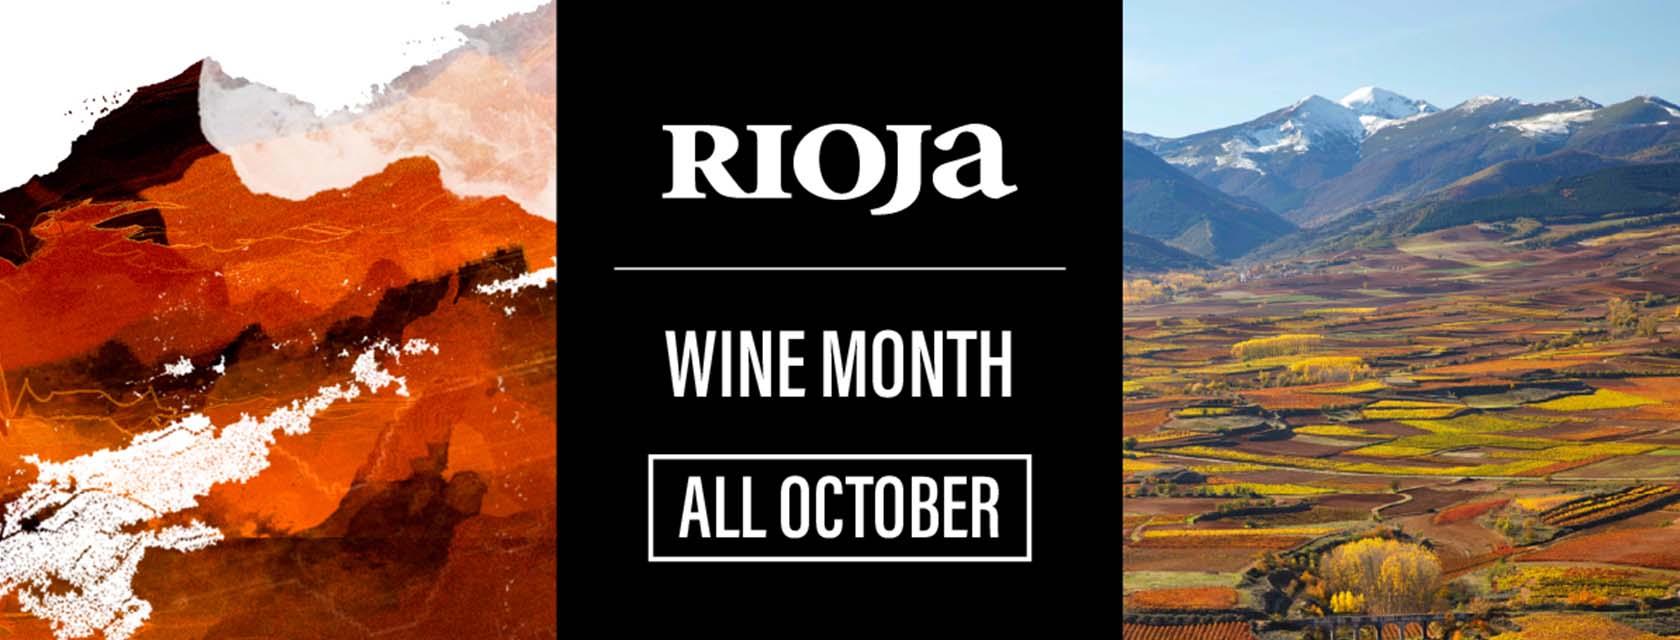 Rioja Wine Month Banner Image